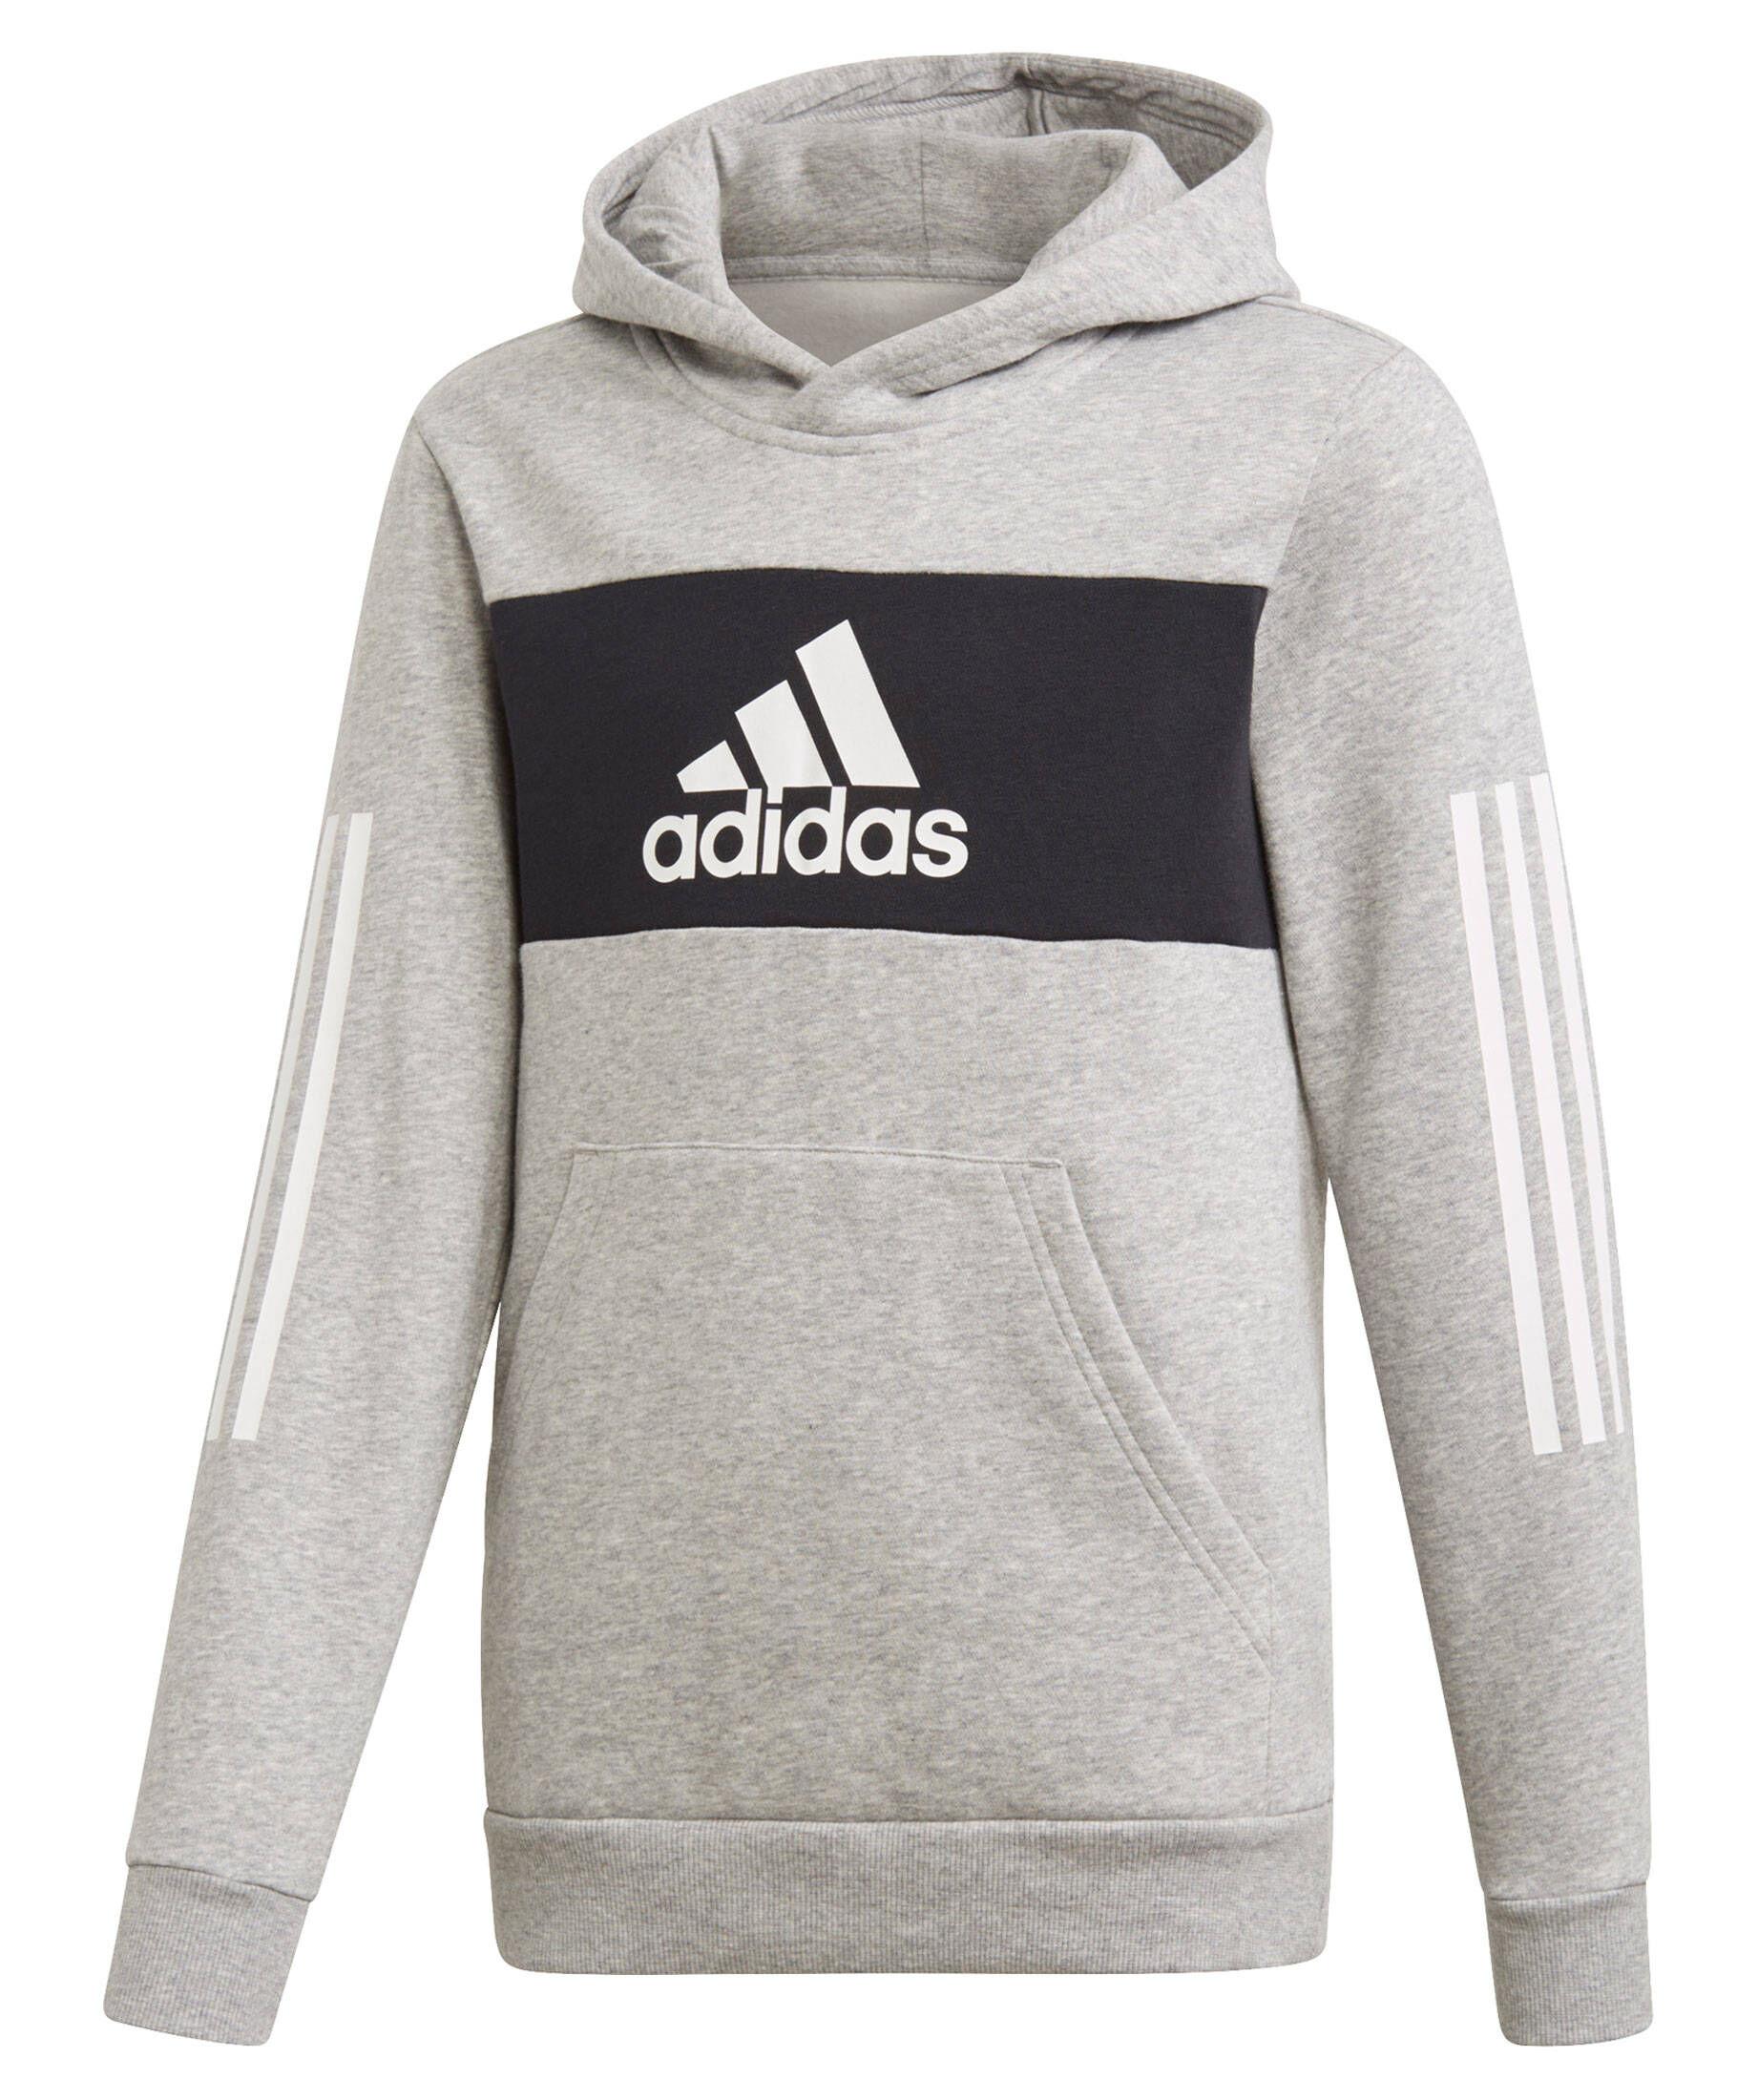 adidas ID Stadium Full Zip Sweatjacke Mädchen Rosa, Schwarz